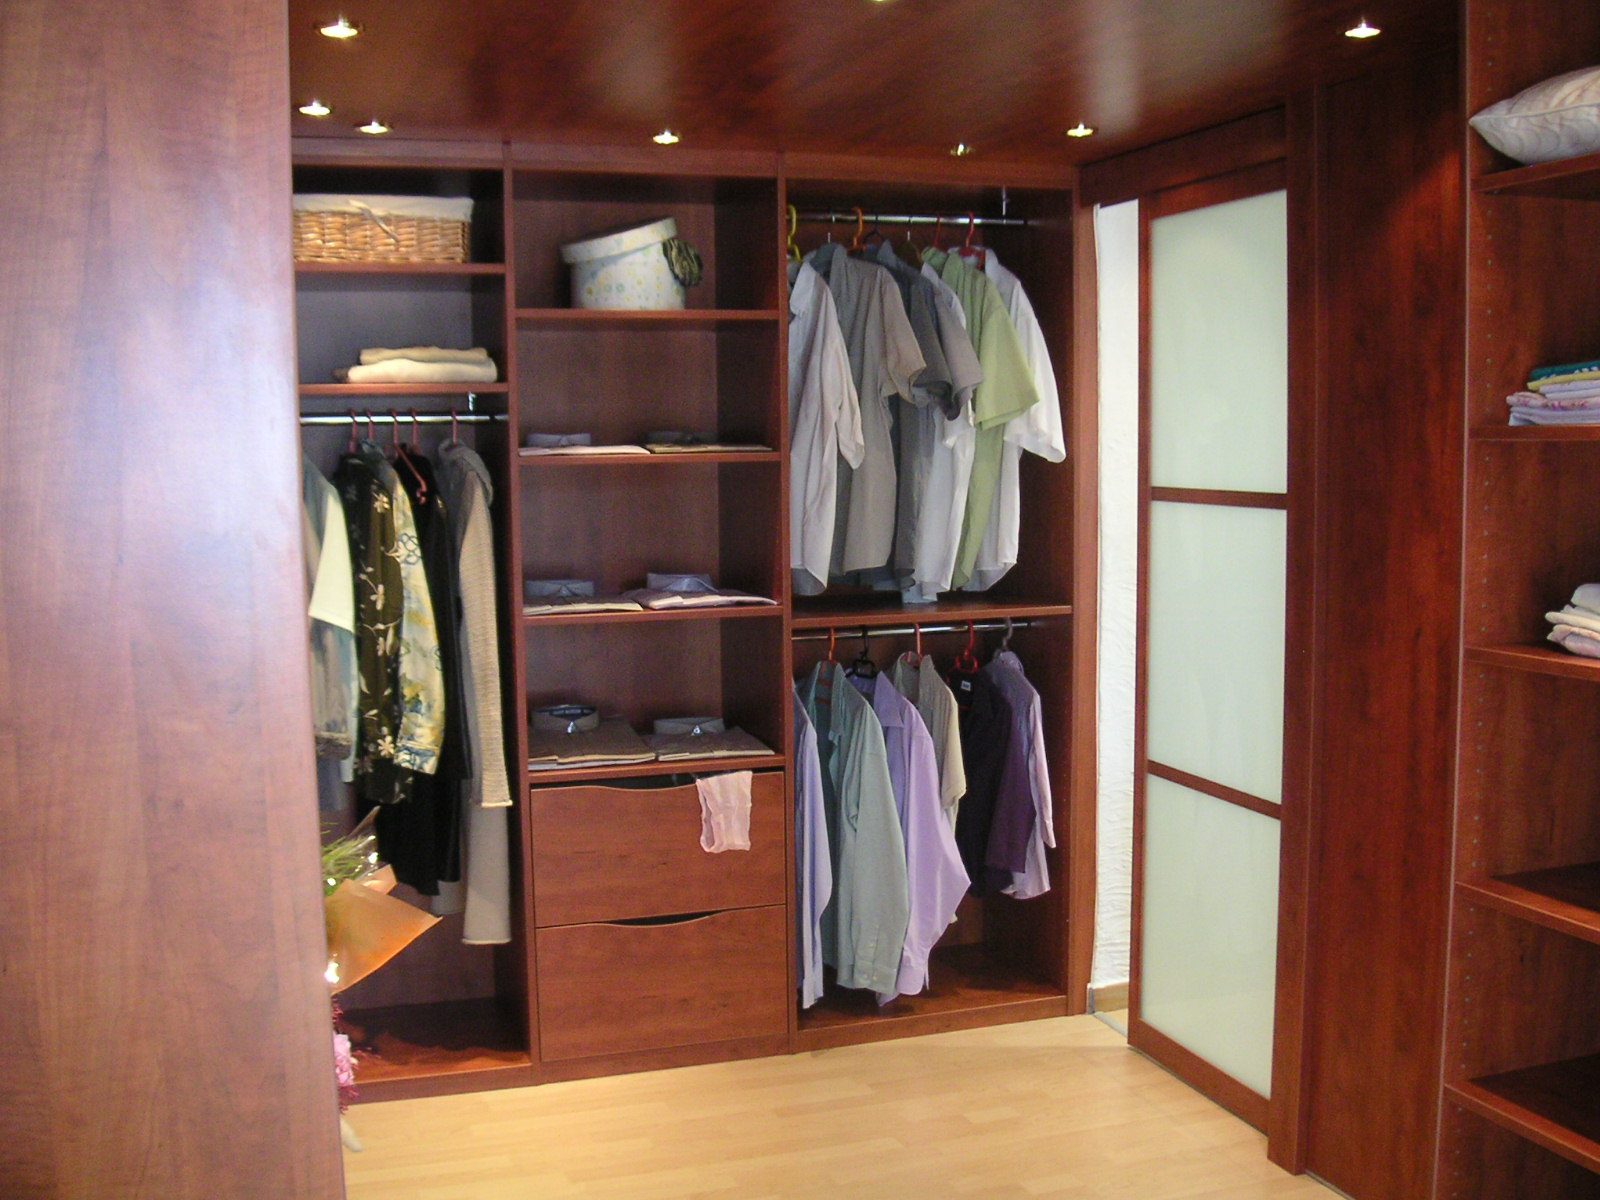 صور غرف ملابس مودرن , اجمل ديكور لغرف النوم